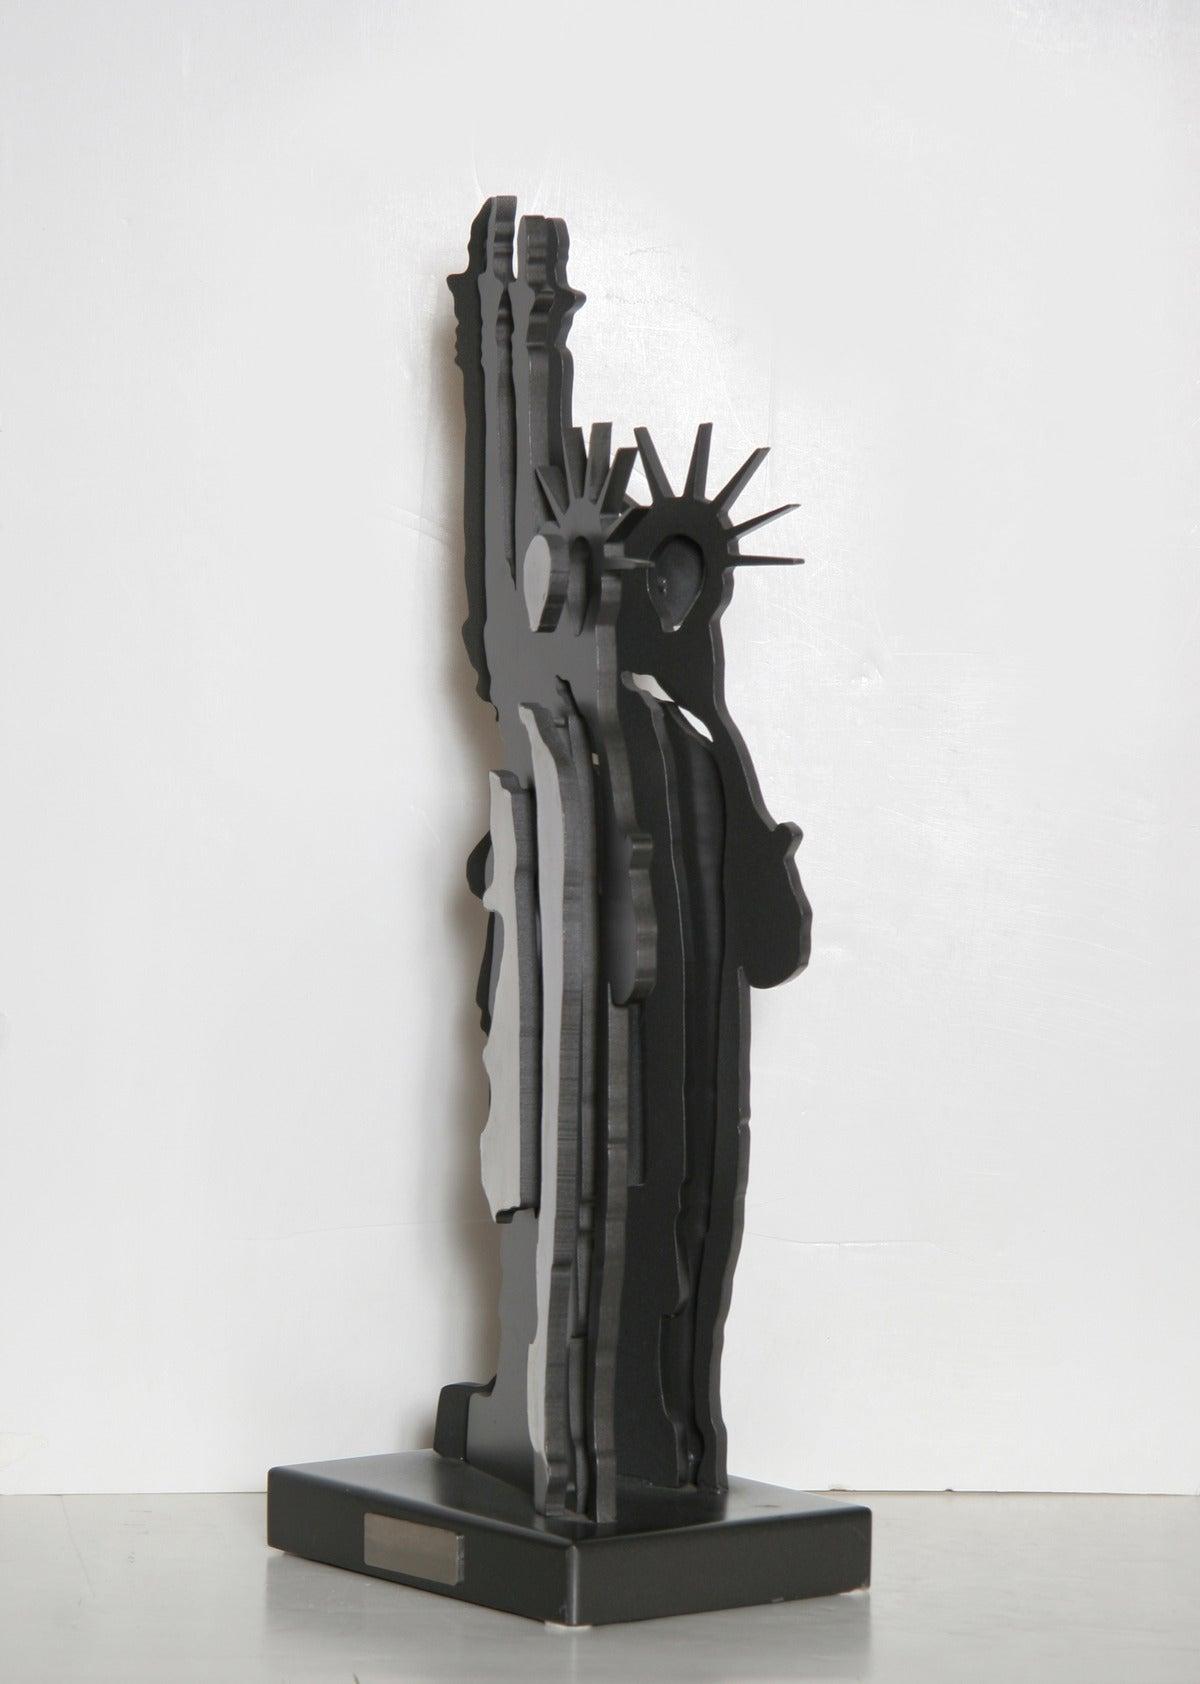 Statue of Liberty - Le Fantome de la Liberte - Sculpture by Fernandez Arman